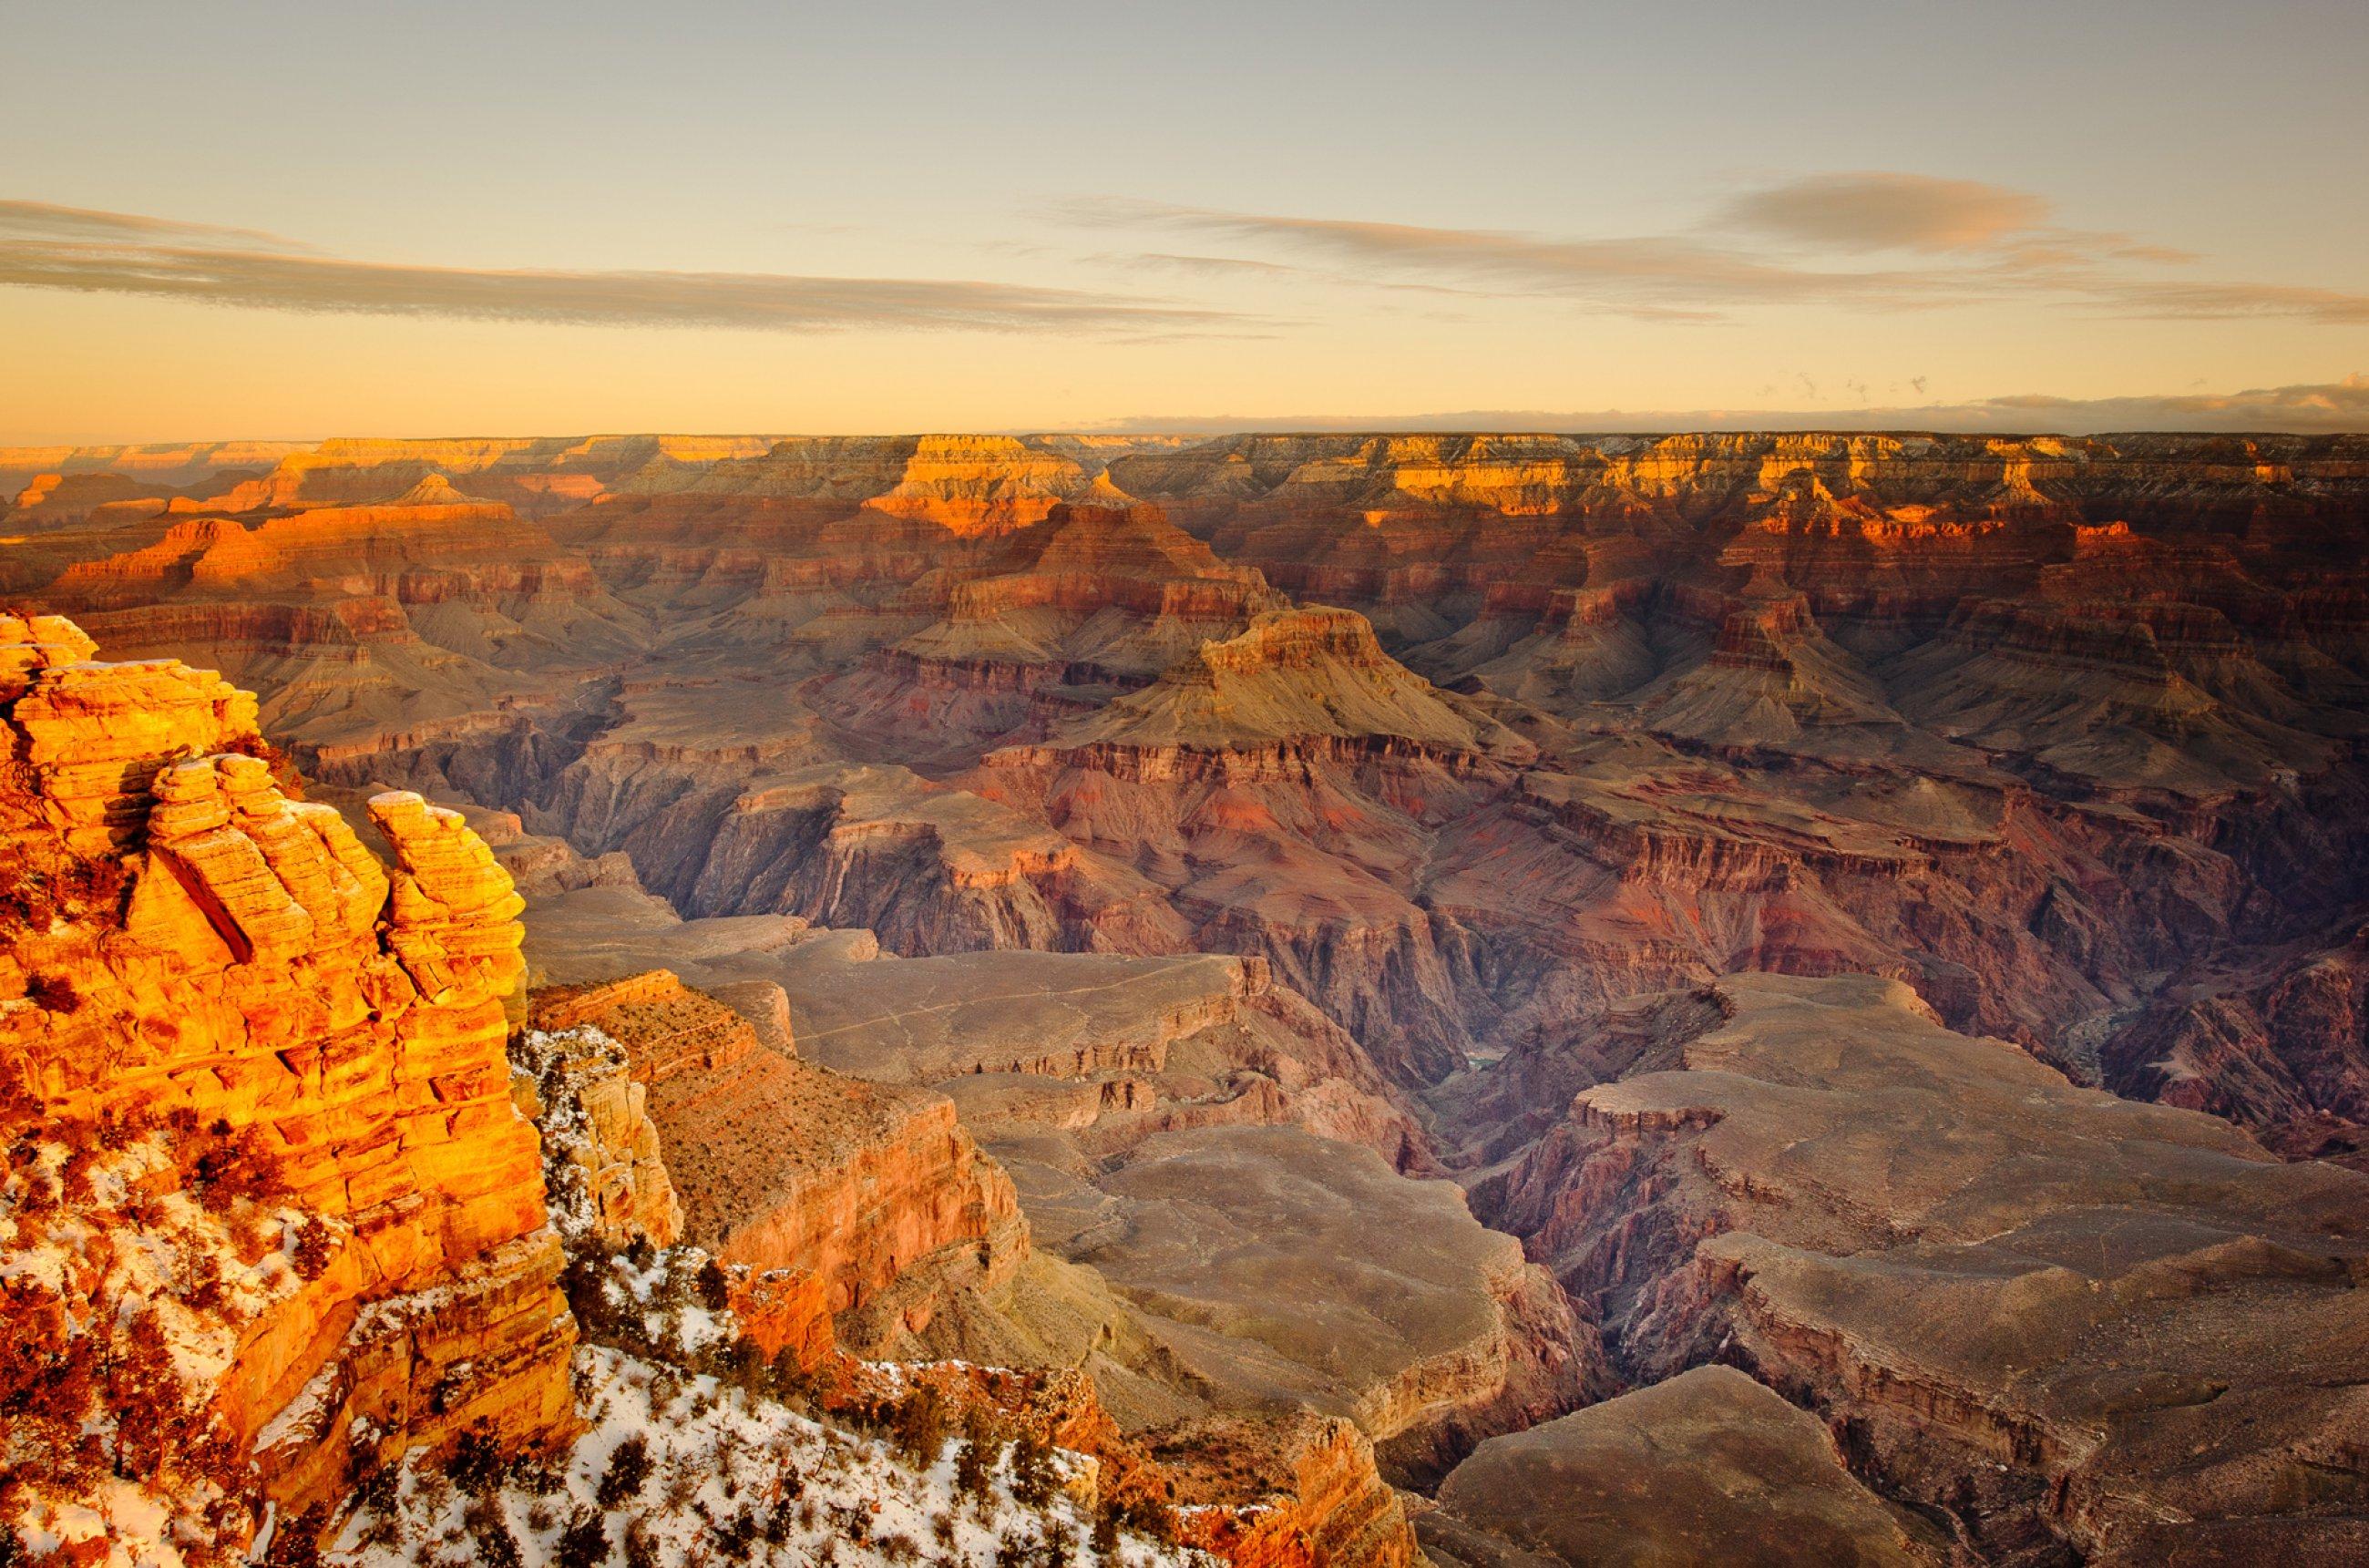 https://bubo.sk/uploads/galleries/16241/grand-canyon-shutterstock-236202247-2-.jpg